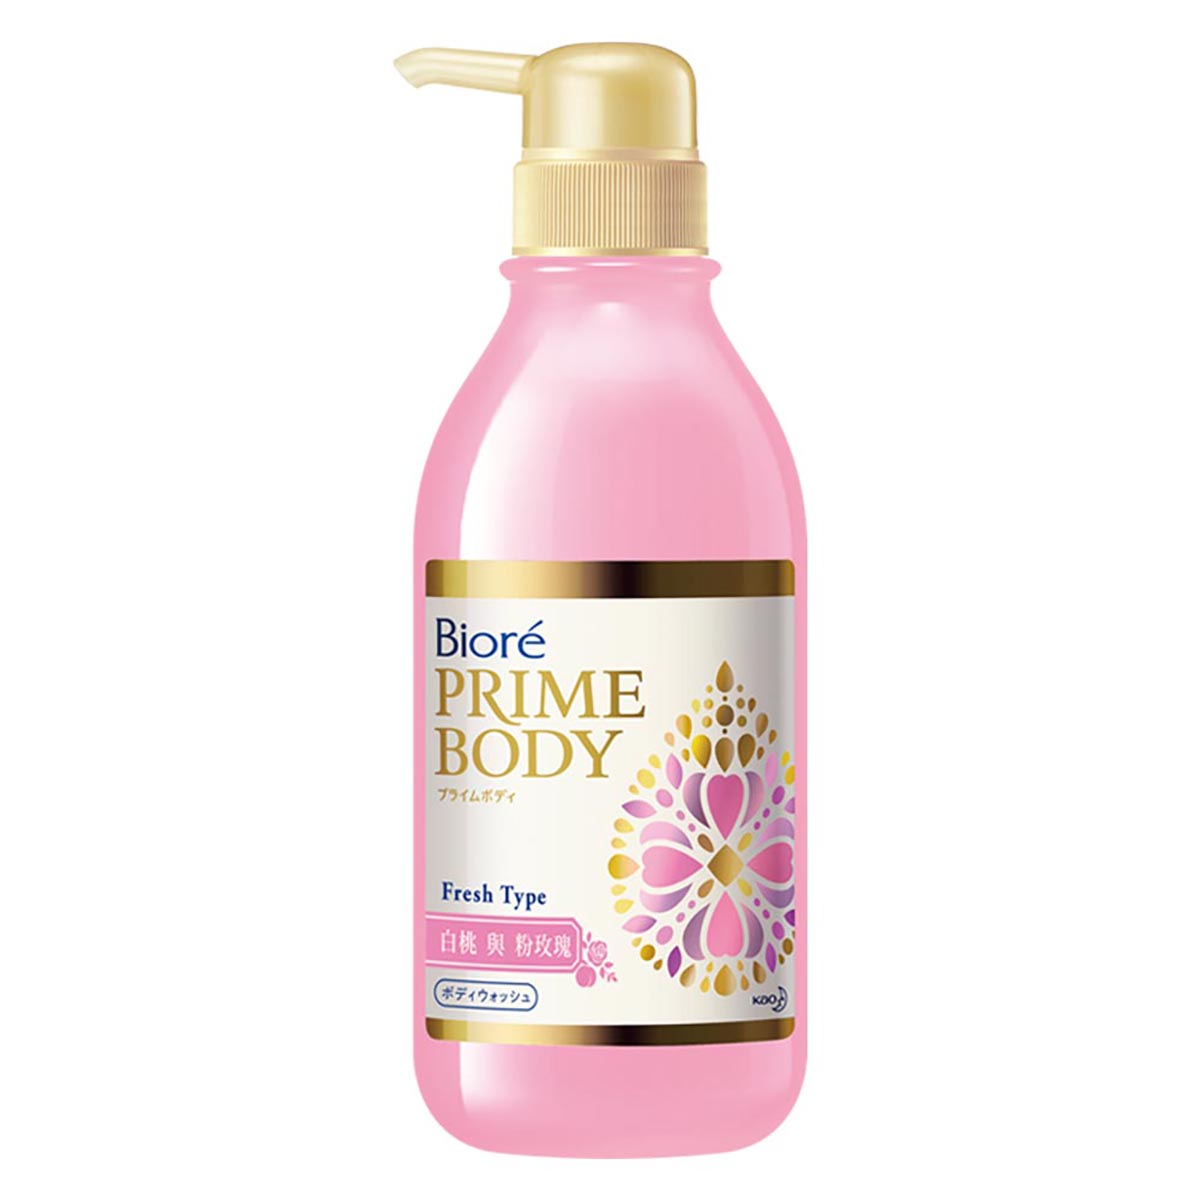 Biore蜜妮極緻精華油沐浴露-白桃與粉玫瑰500ml